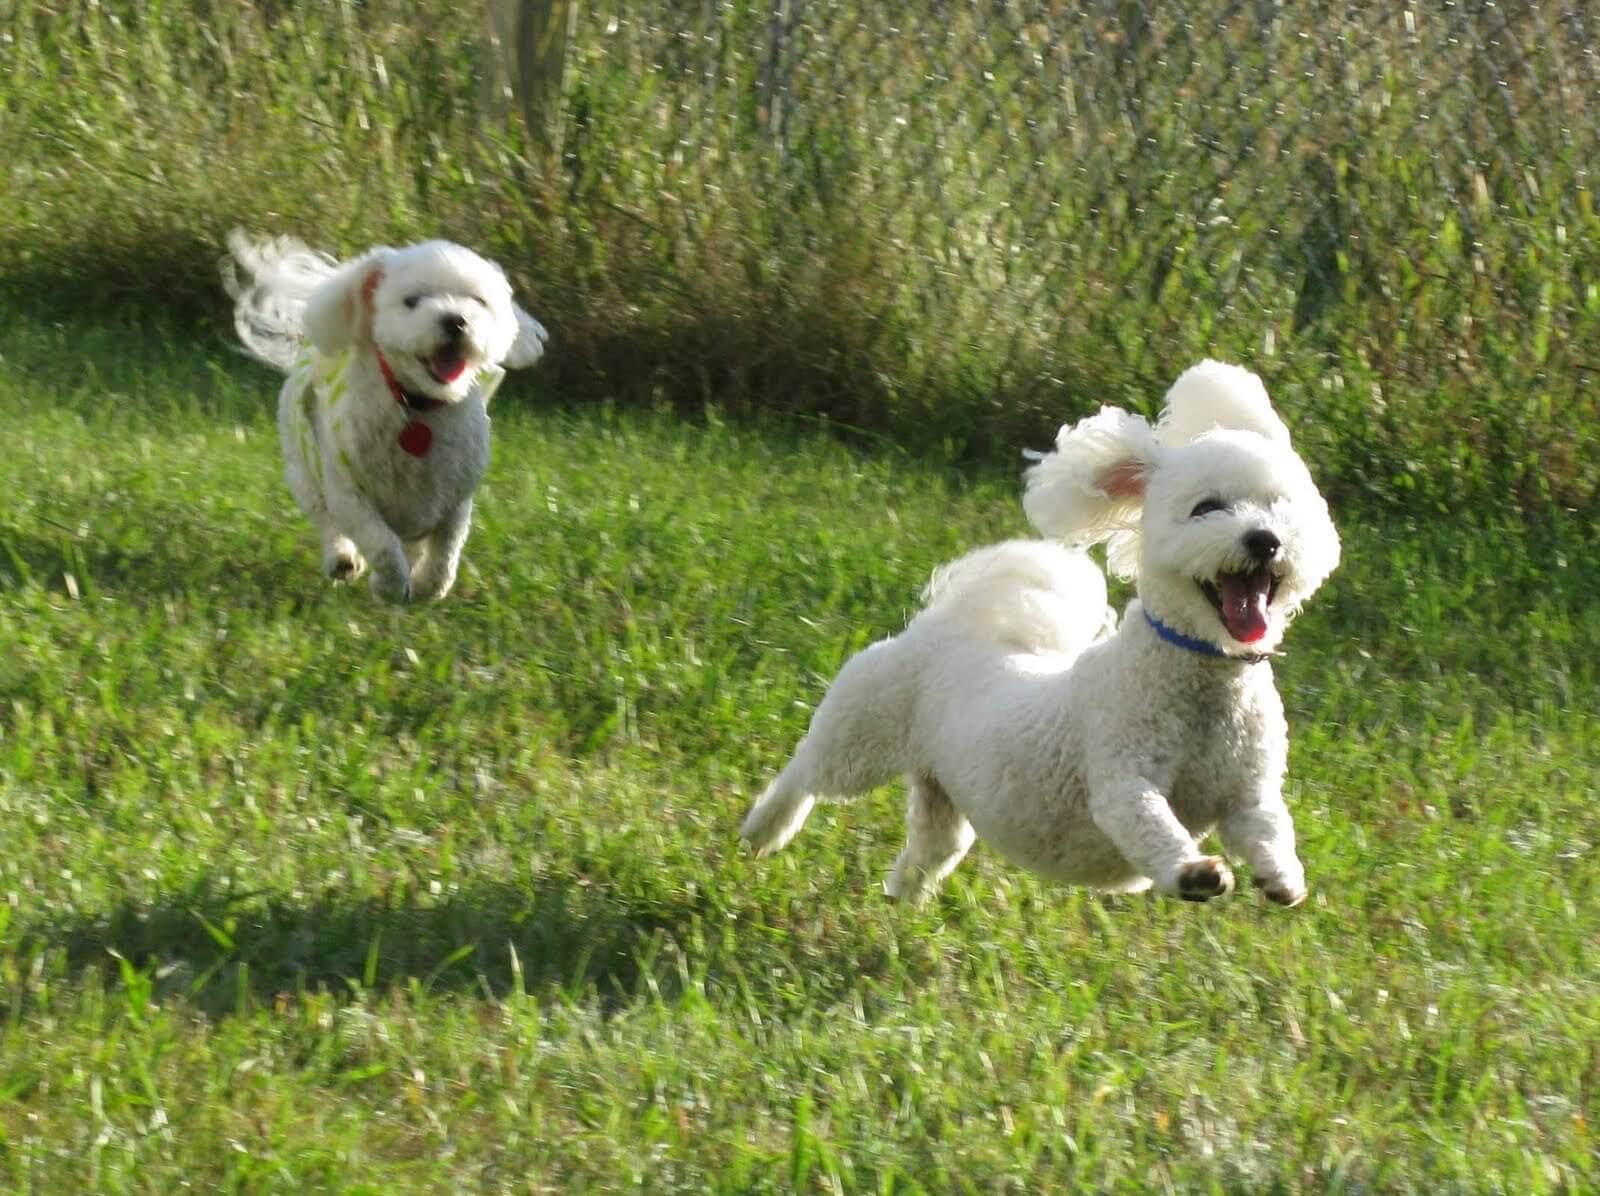 Perros ejercitandose